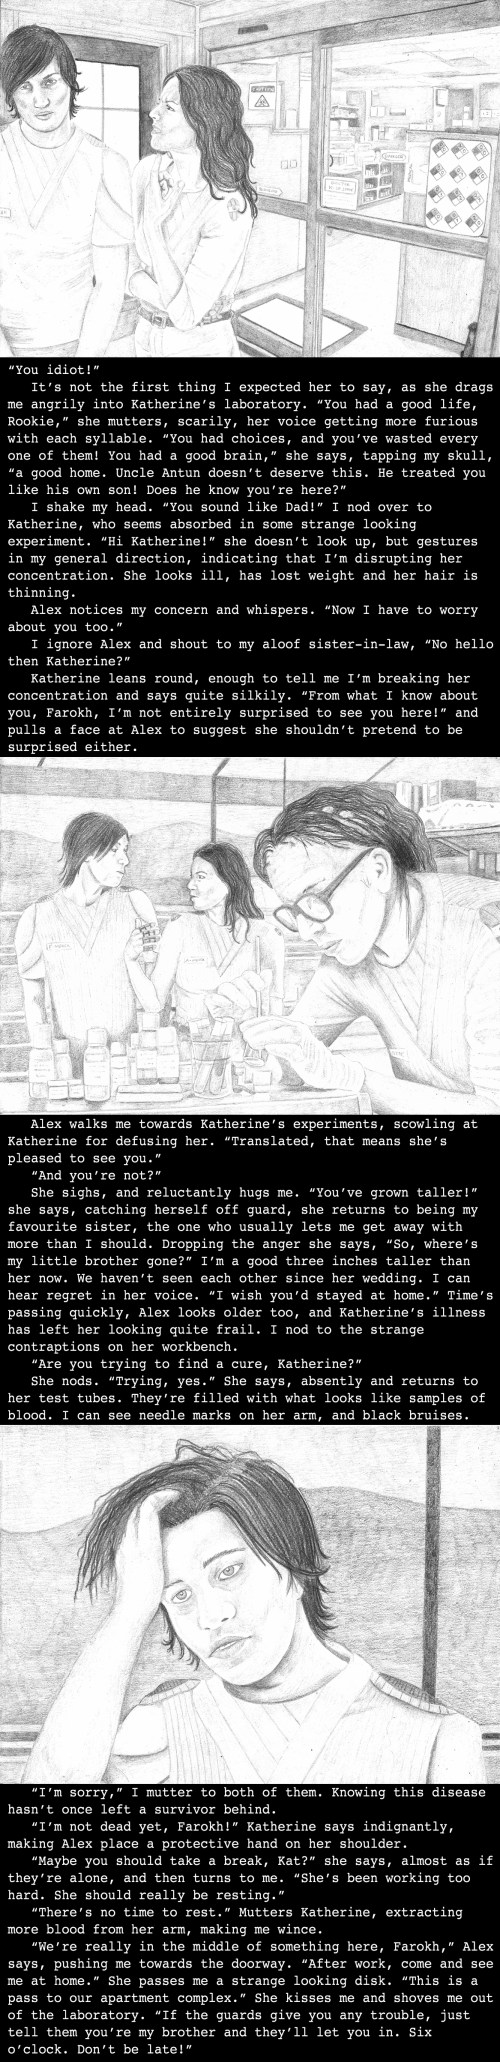 Farokh's backstory, set in Saskatoon military base, India (3990)